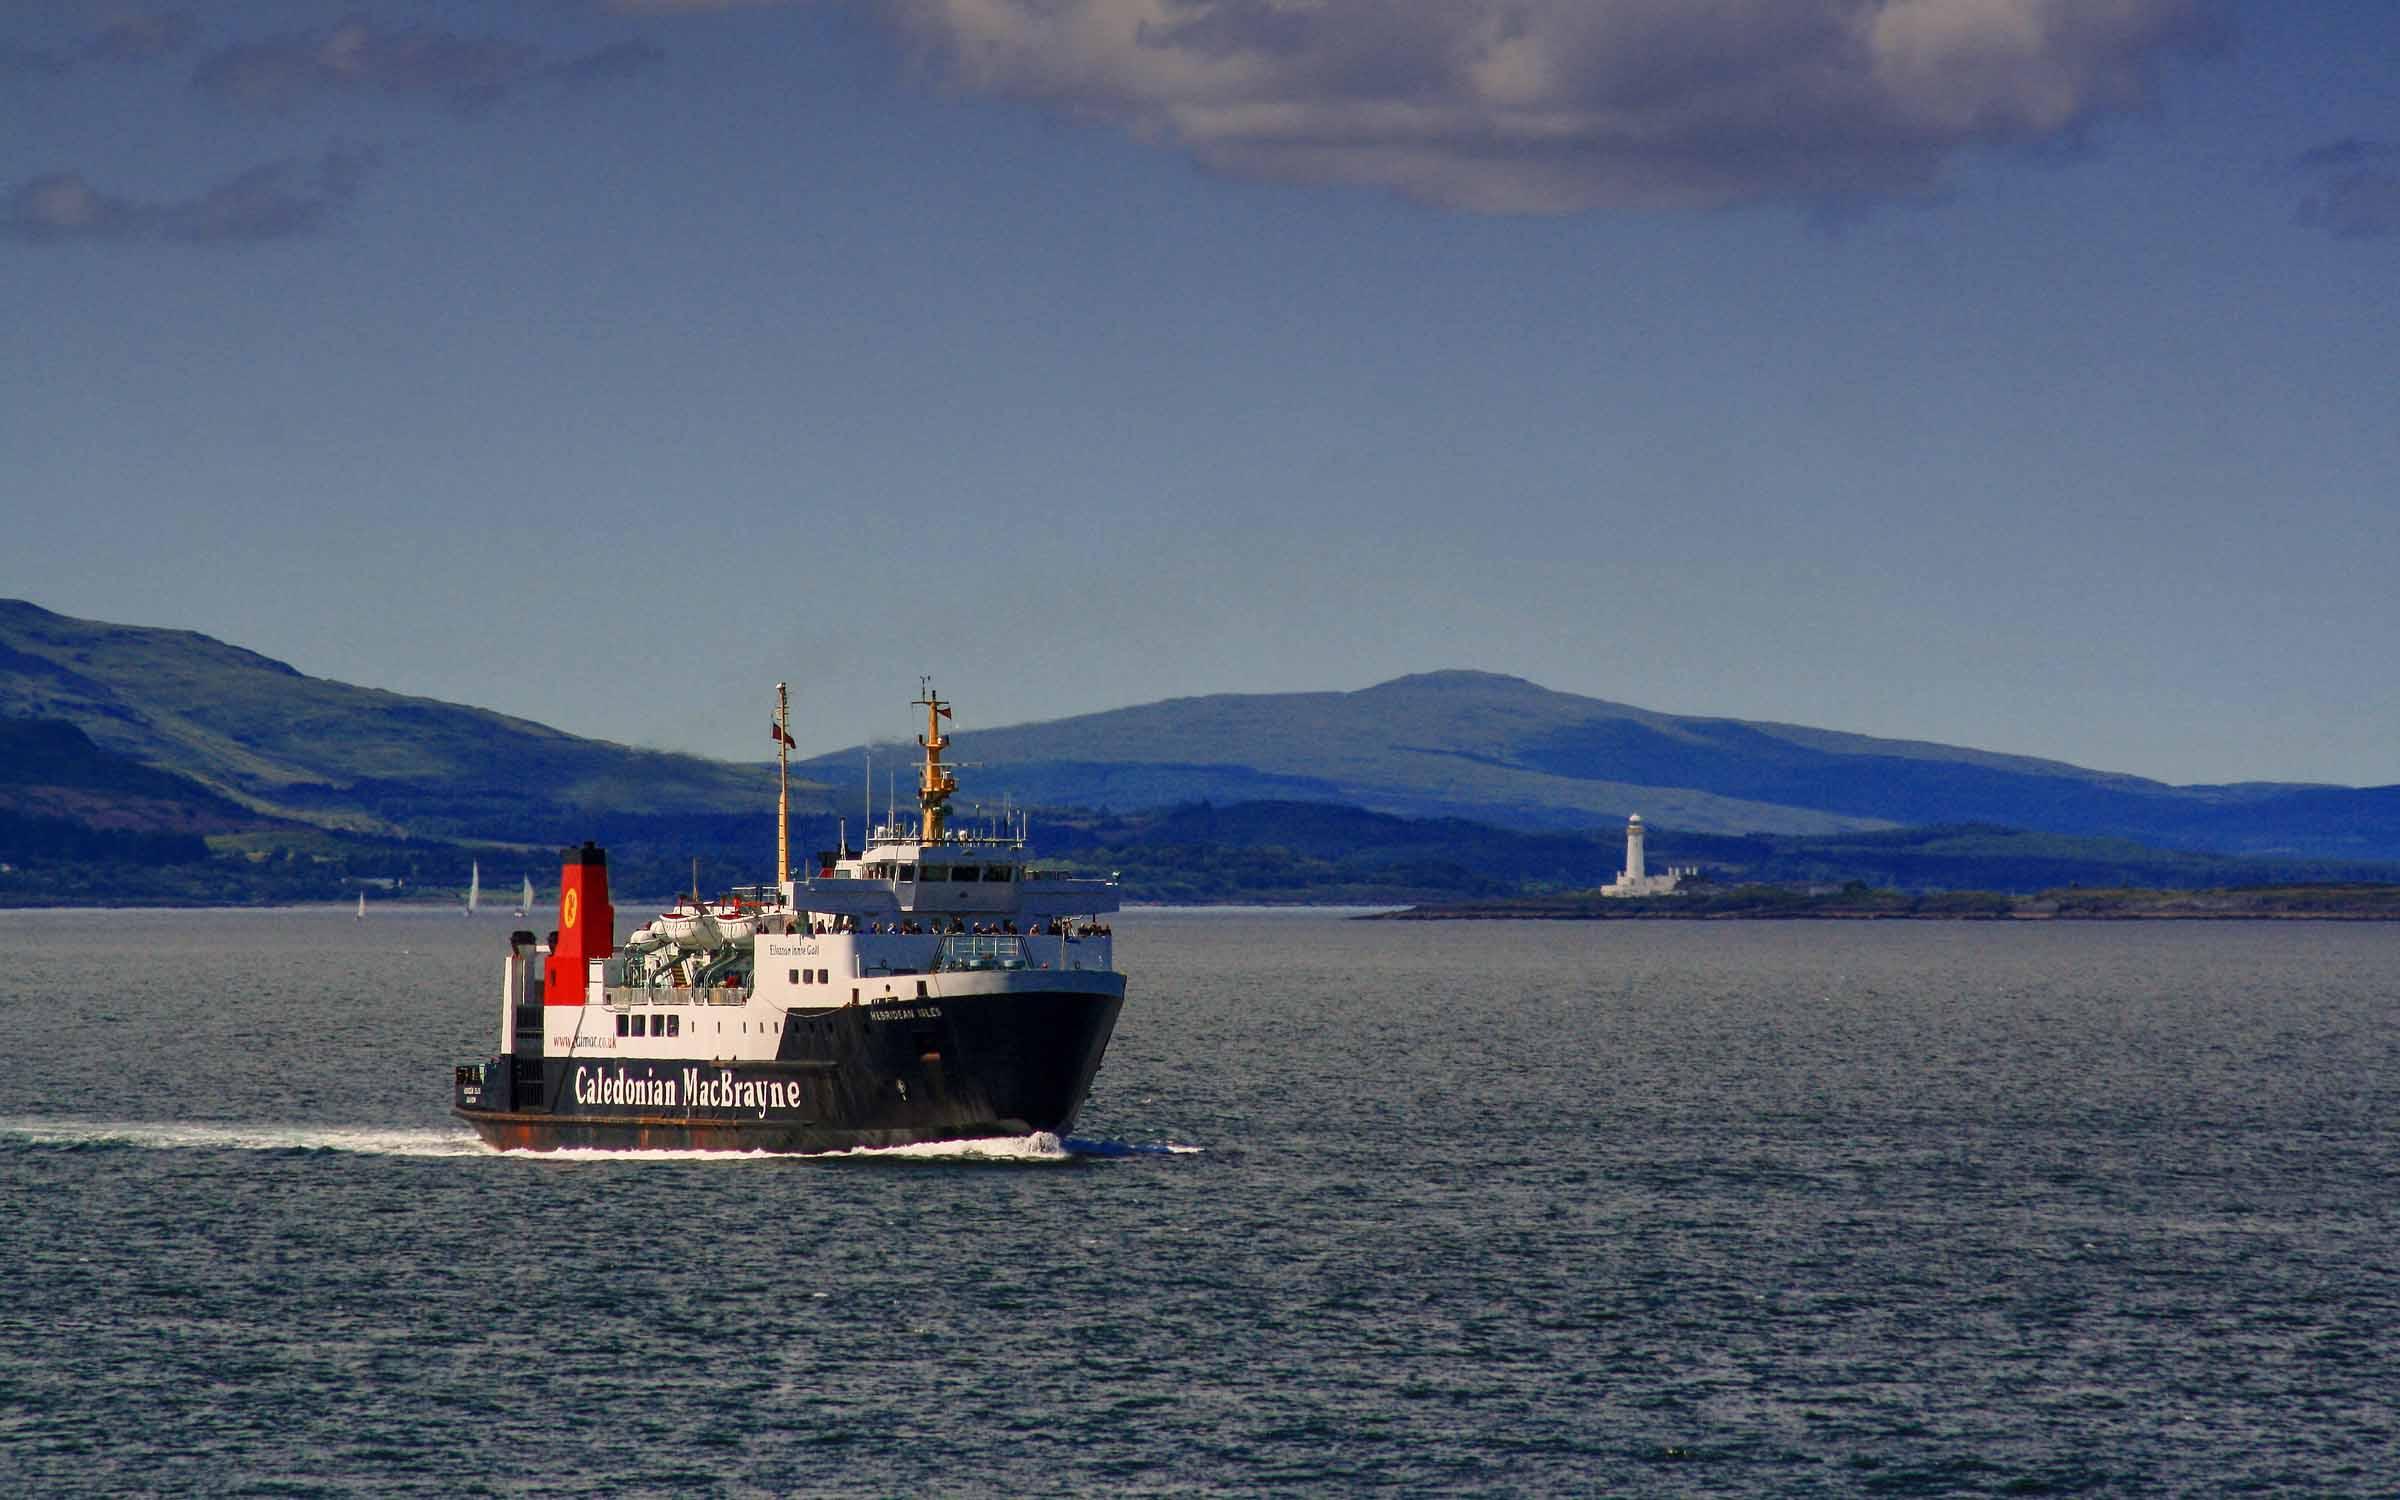 Hebridean Isles approaching Oban (Ships of CalMac)